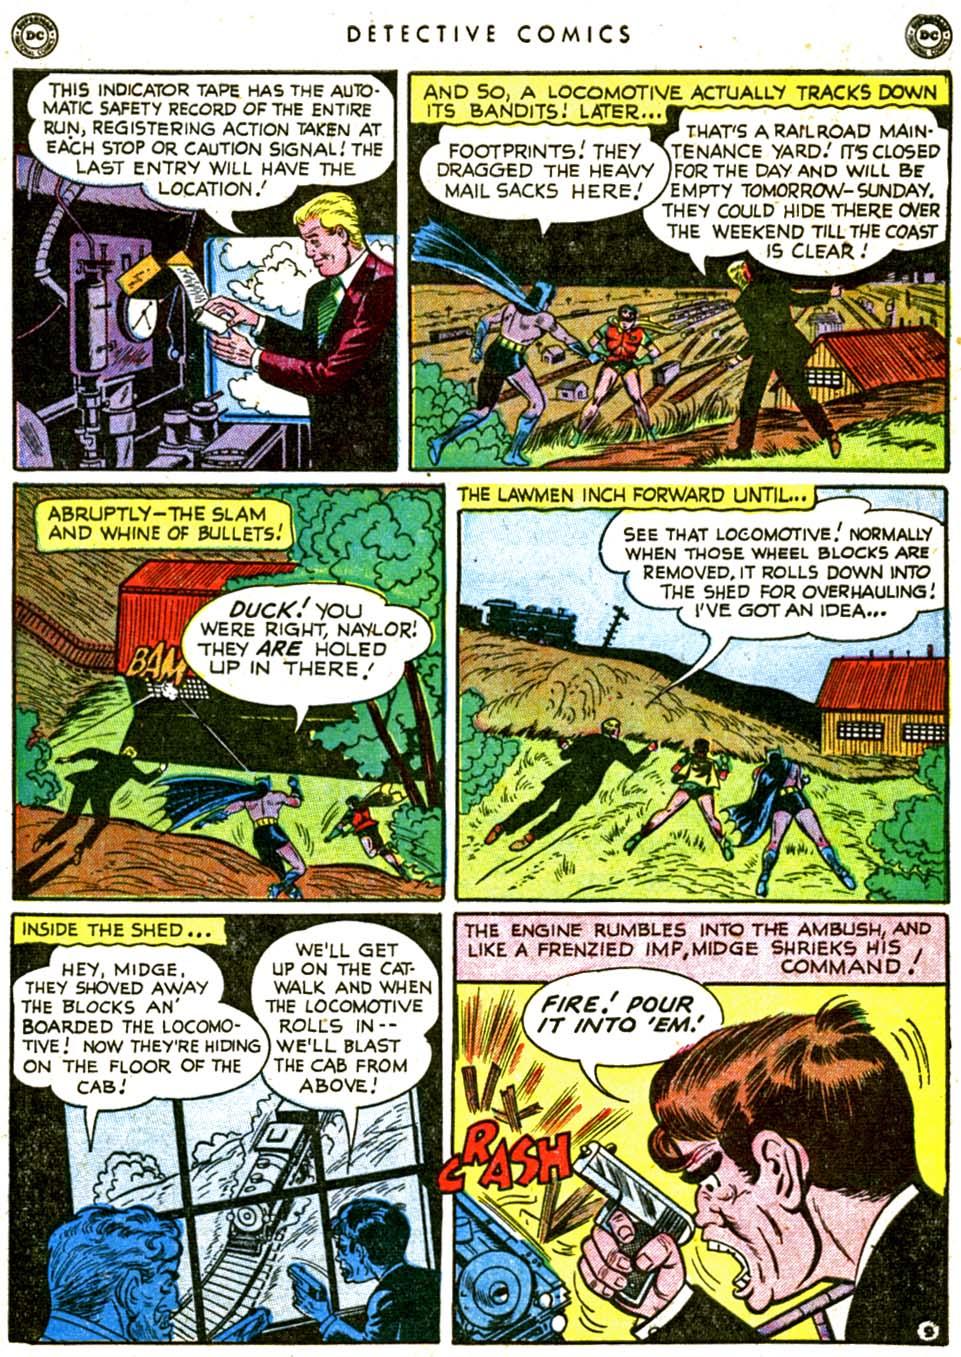 Read online Detective Comics (1937) comic -  Issue #162 - 11